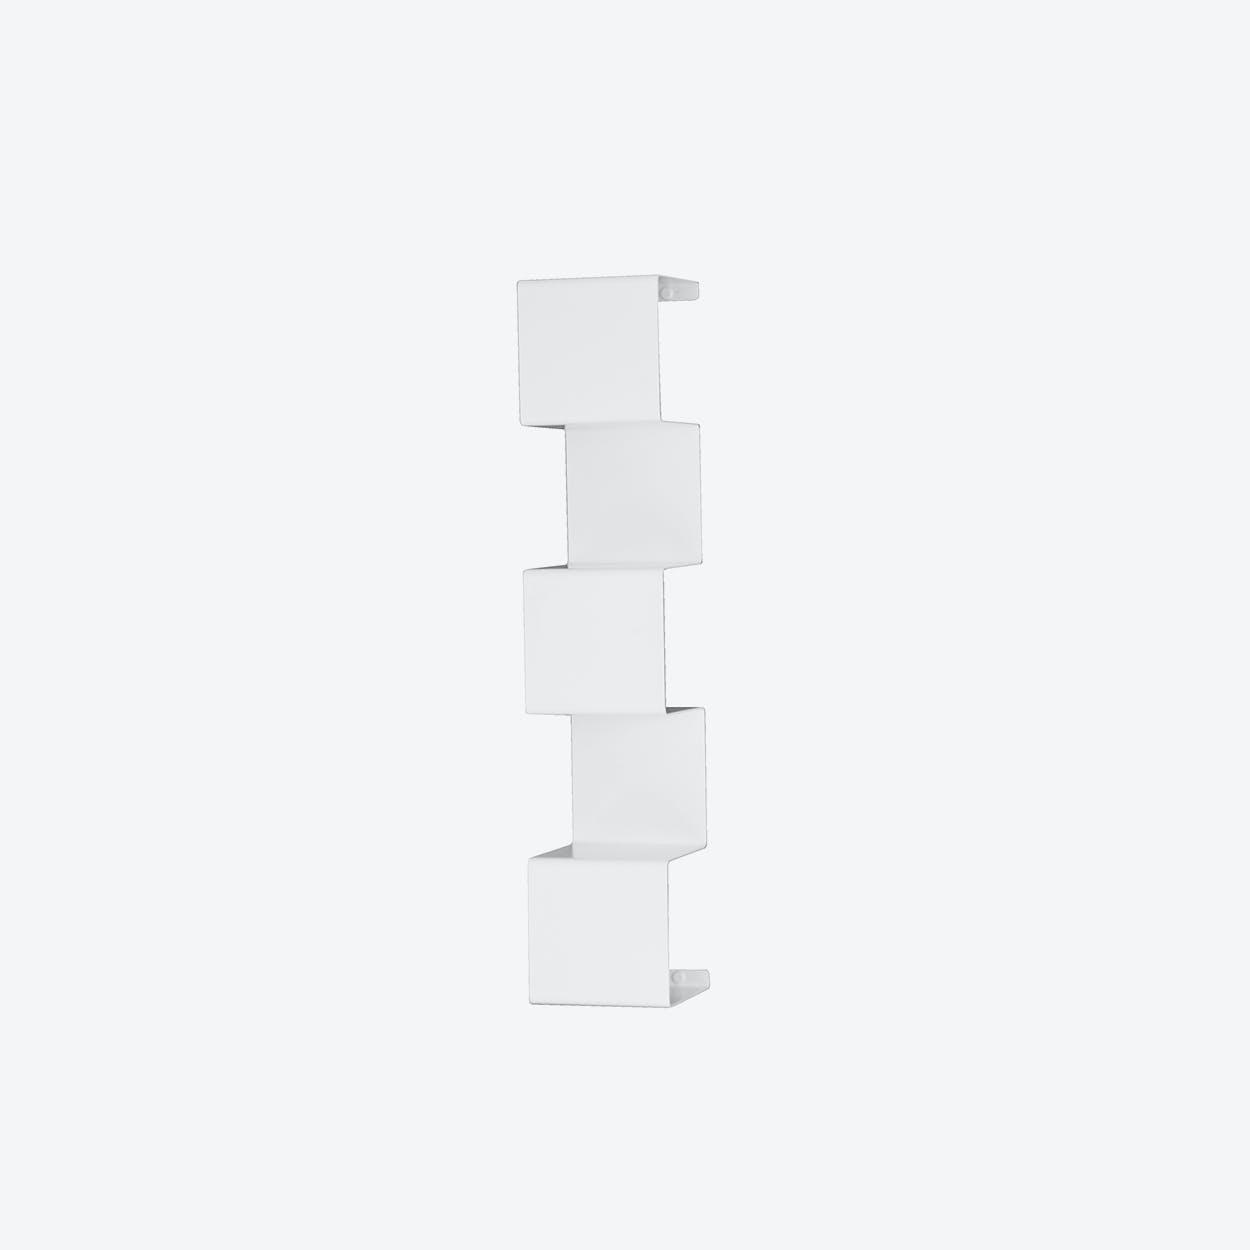 Showcase#4 in White